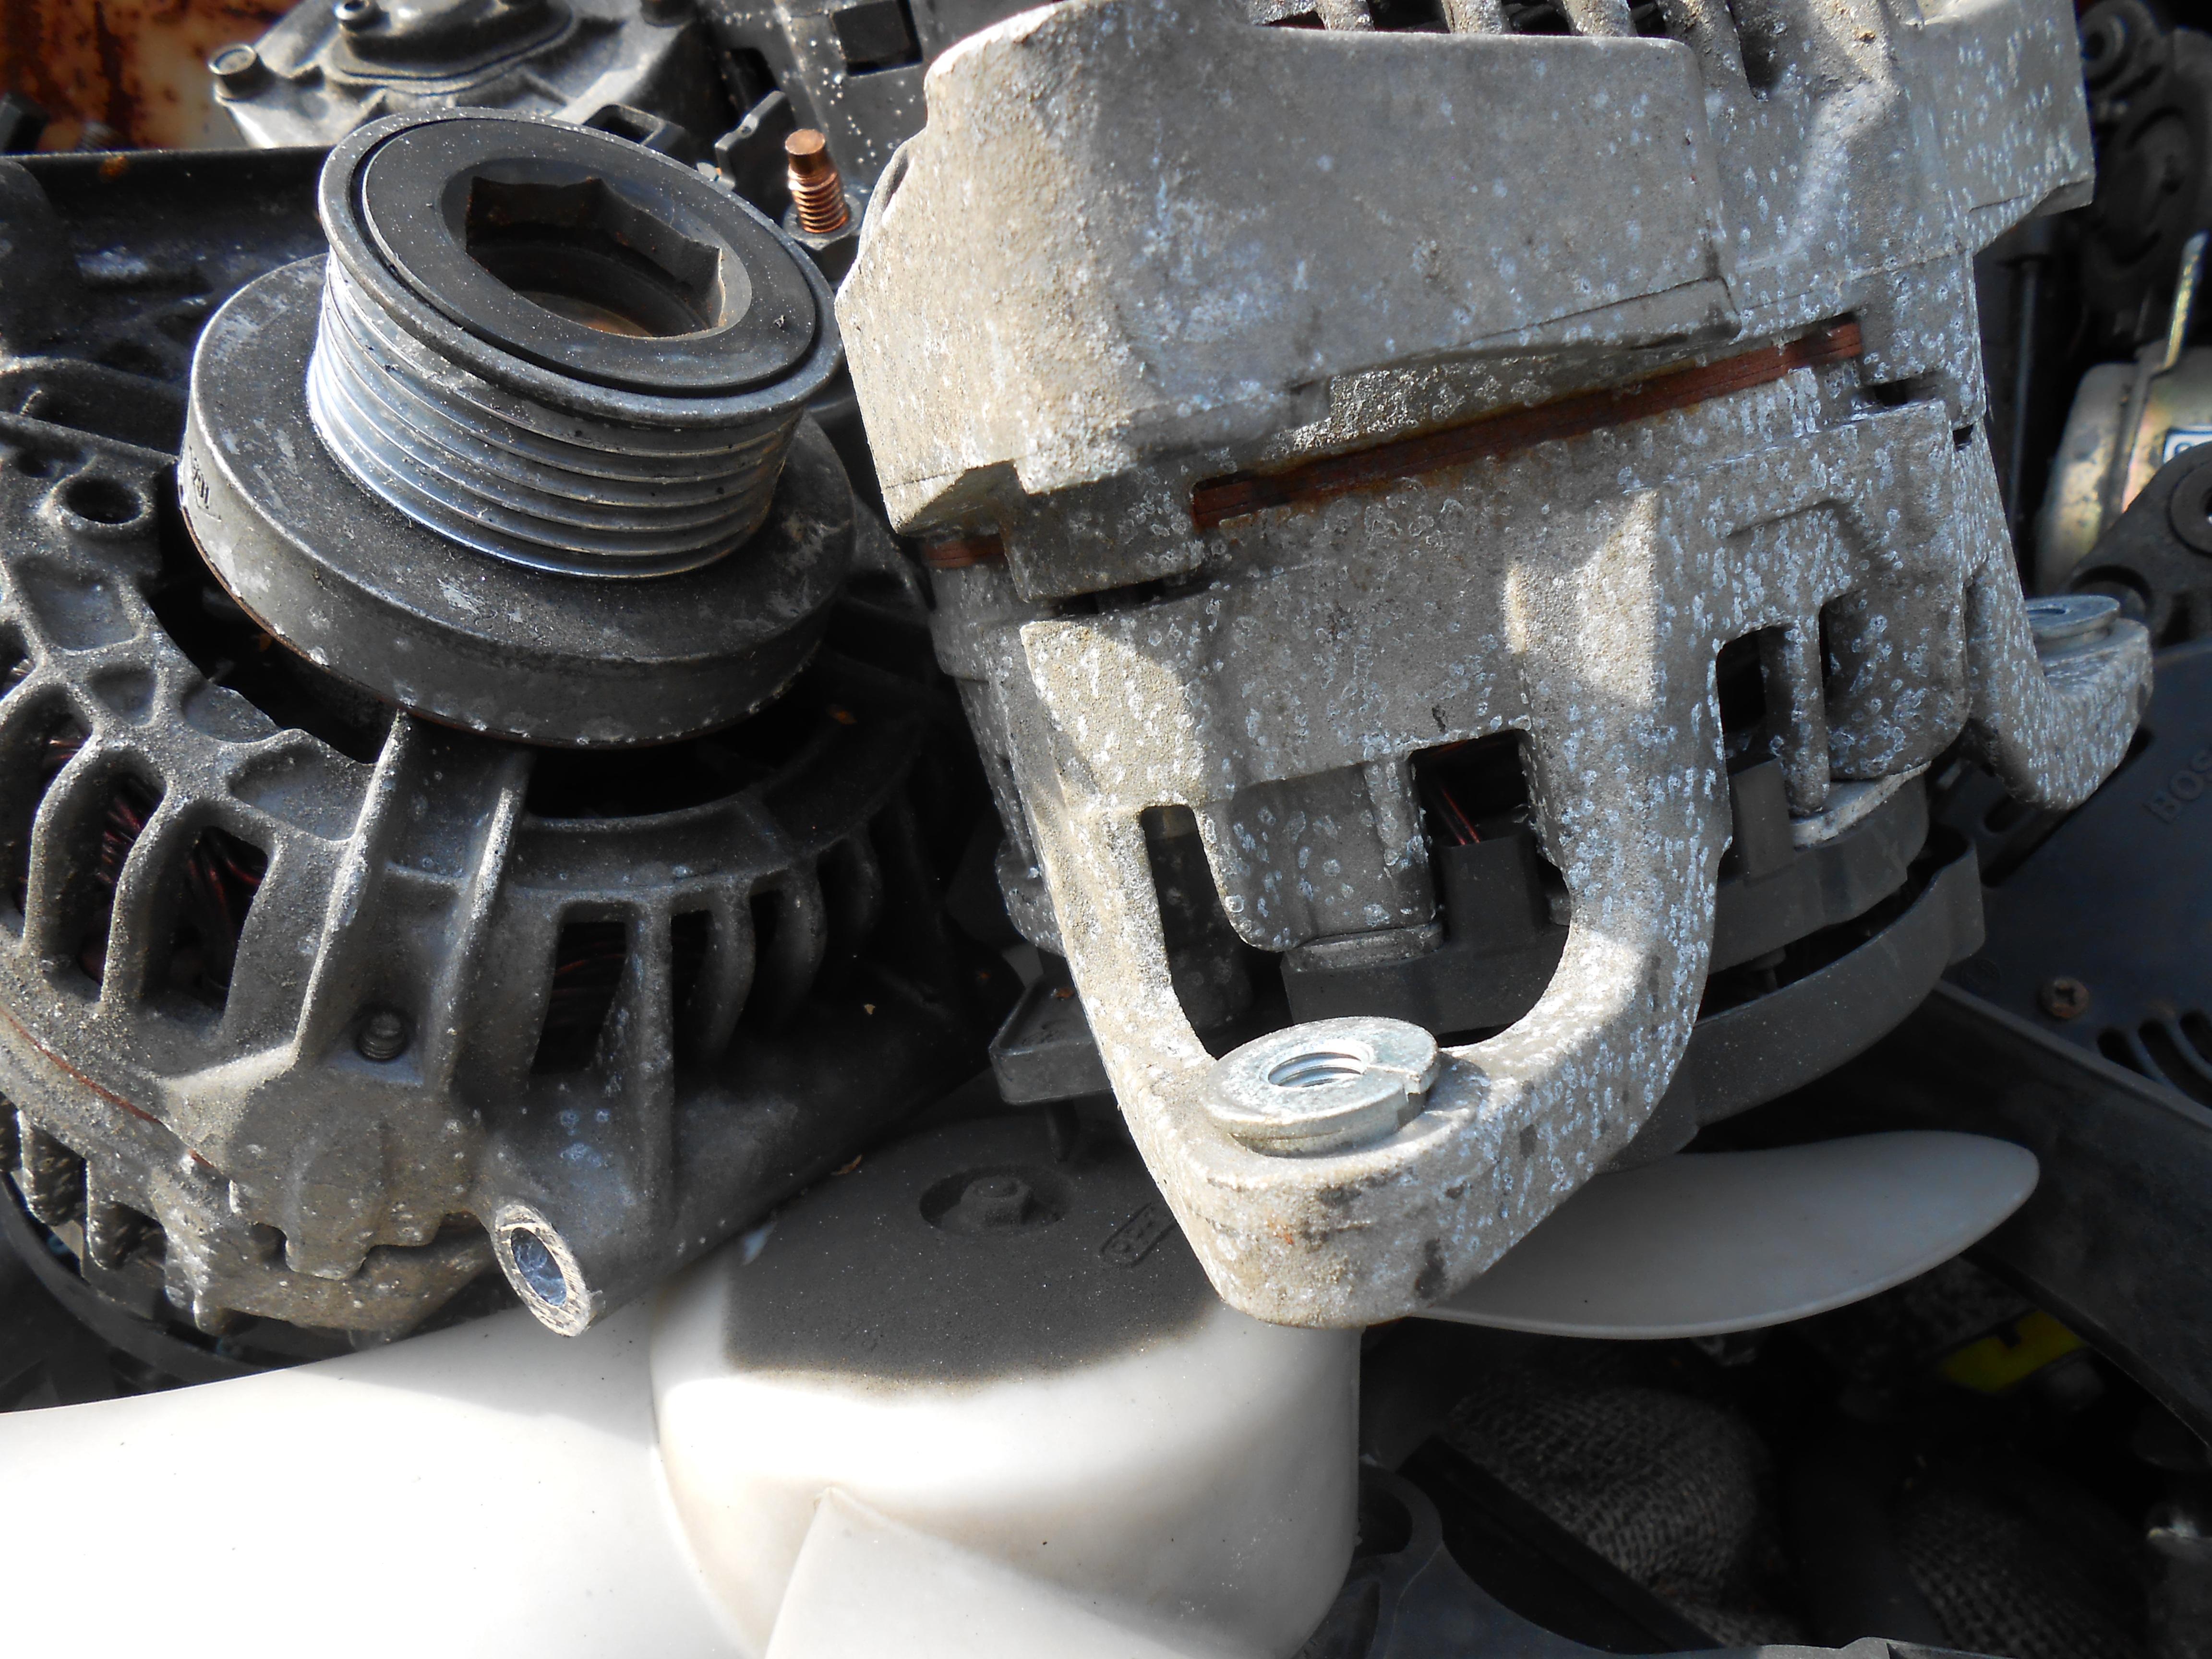 Kostenlose foto : Rad, Fahrzeug, Lenkrad, Reifen, Stoßstange, grau ...